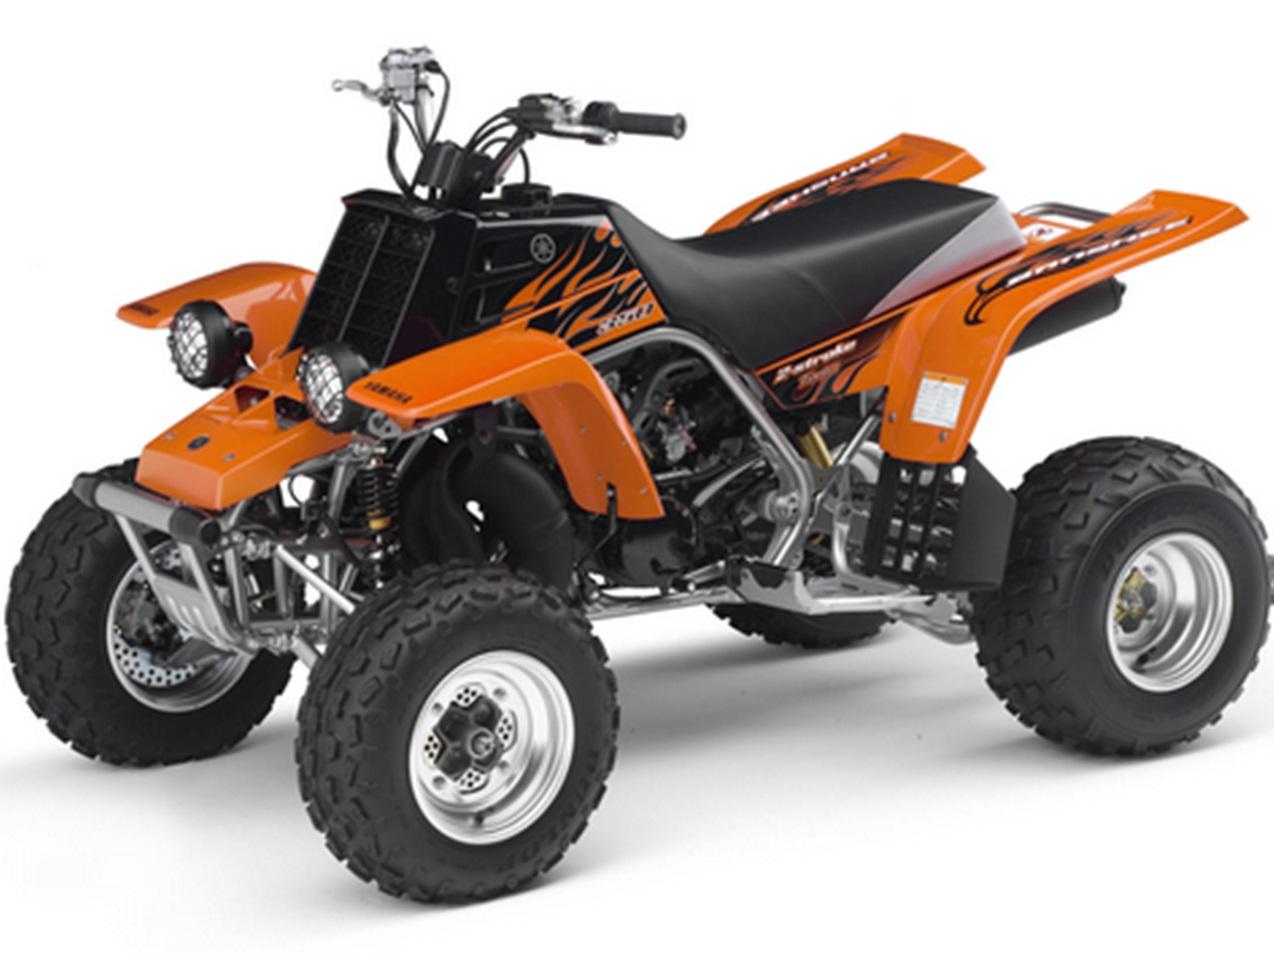 Yamaha Banshee Review : Yamaha ATV YFZ350 Banshee Specs